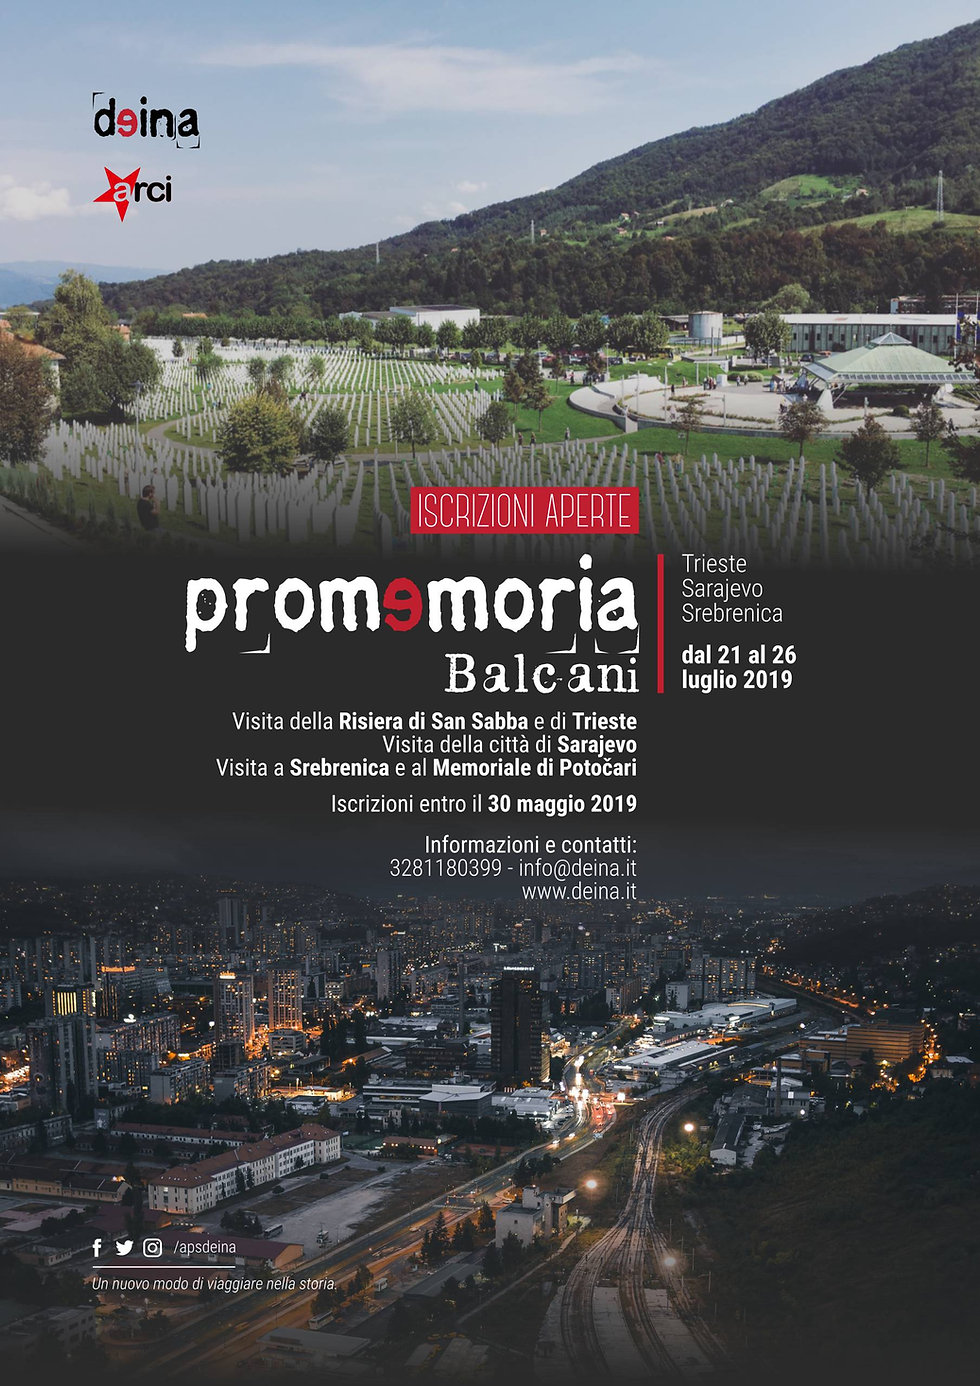 locandina promemoria balcani 2019 web.jp